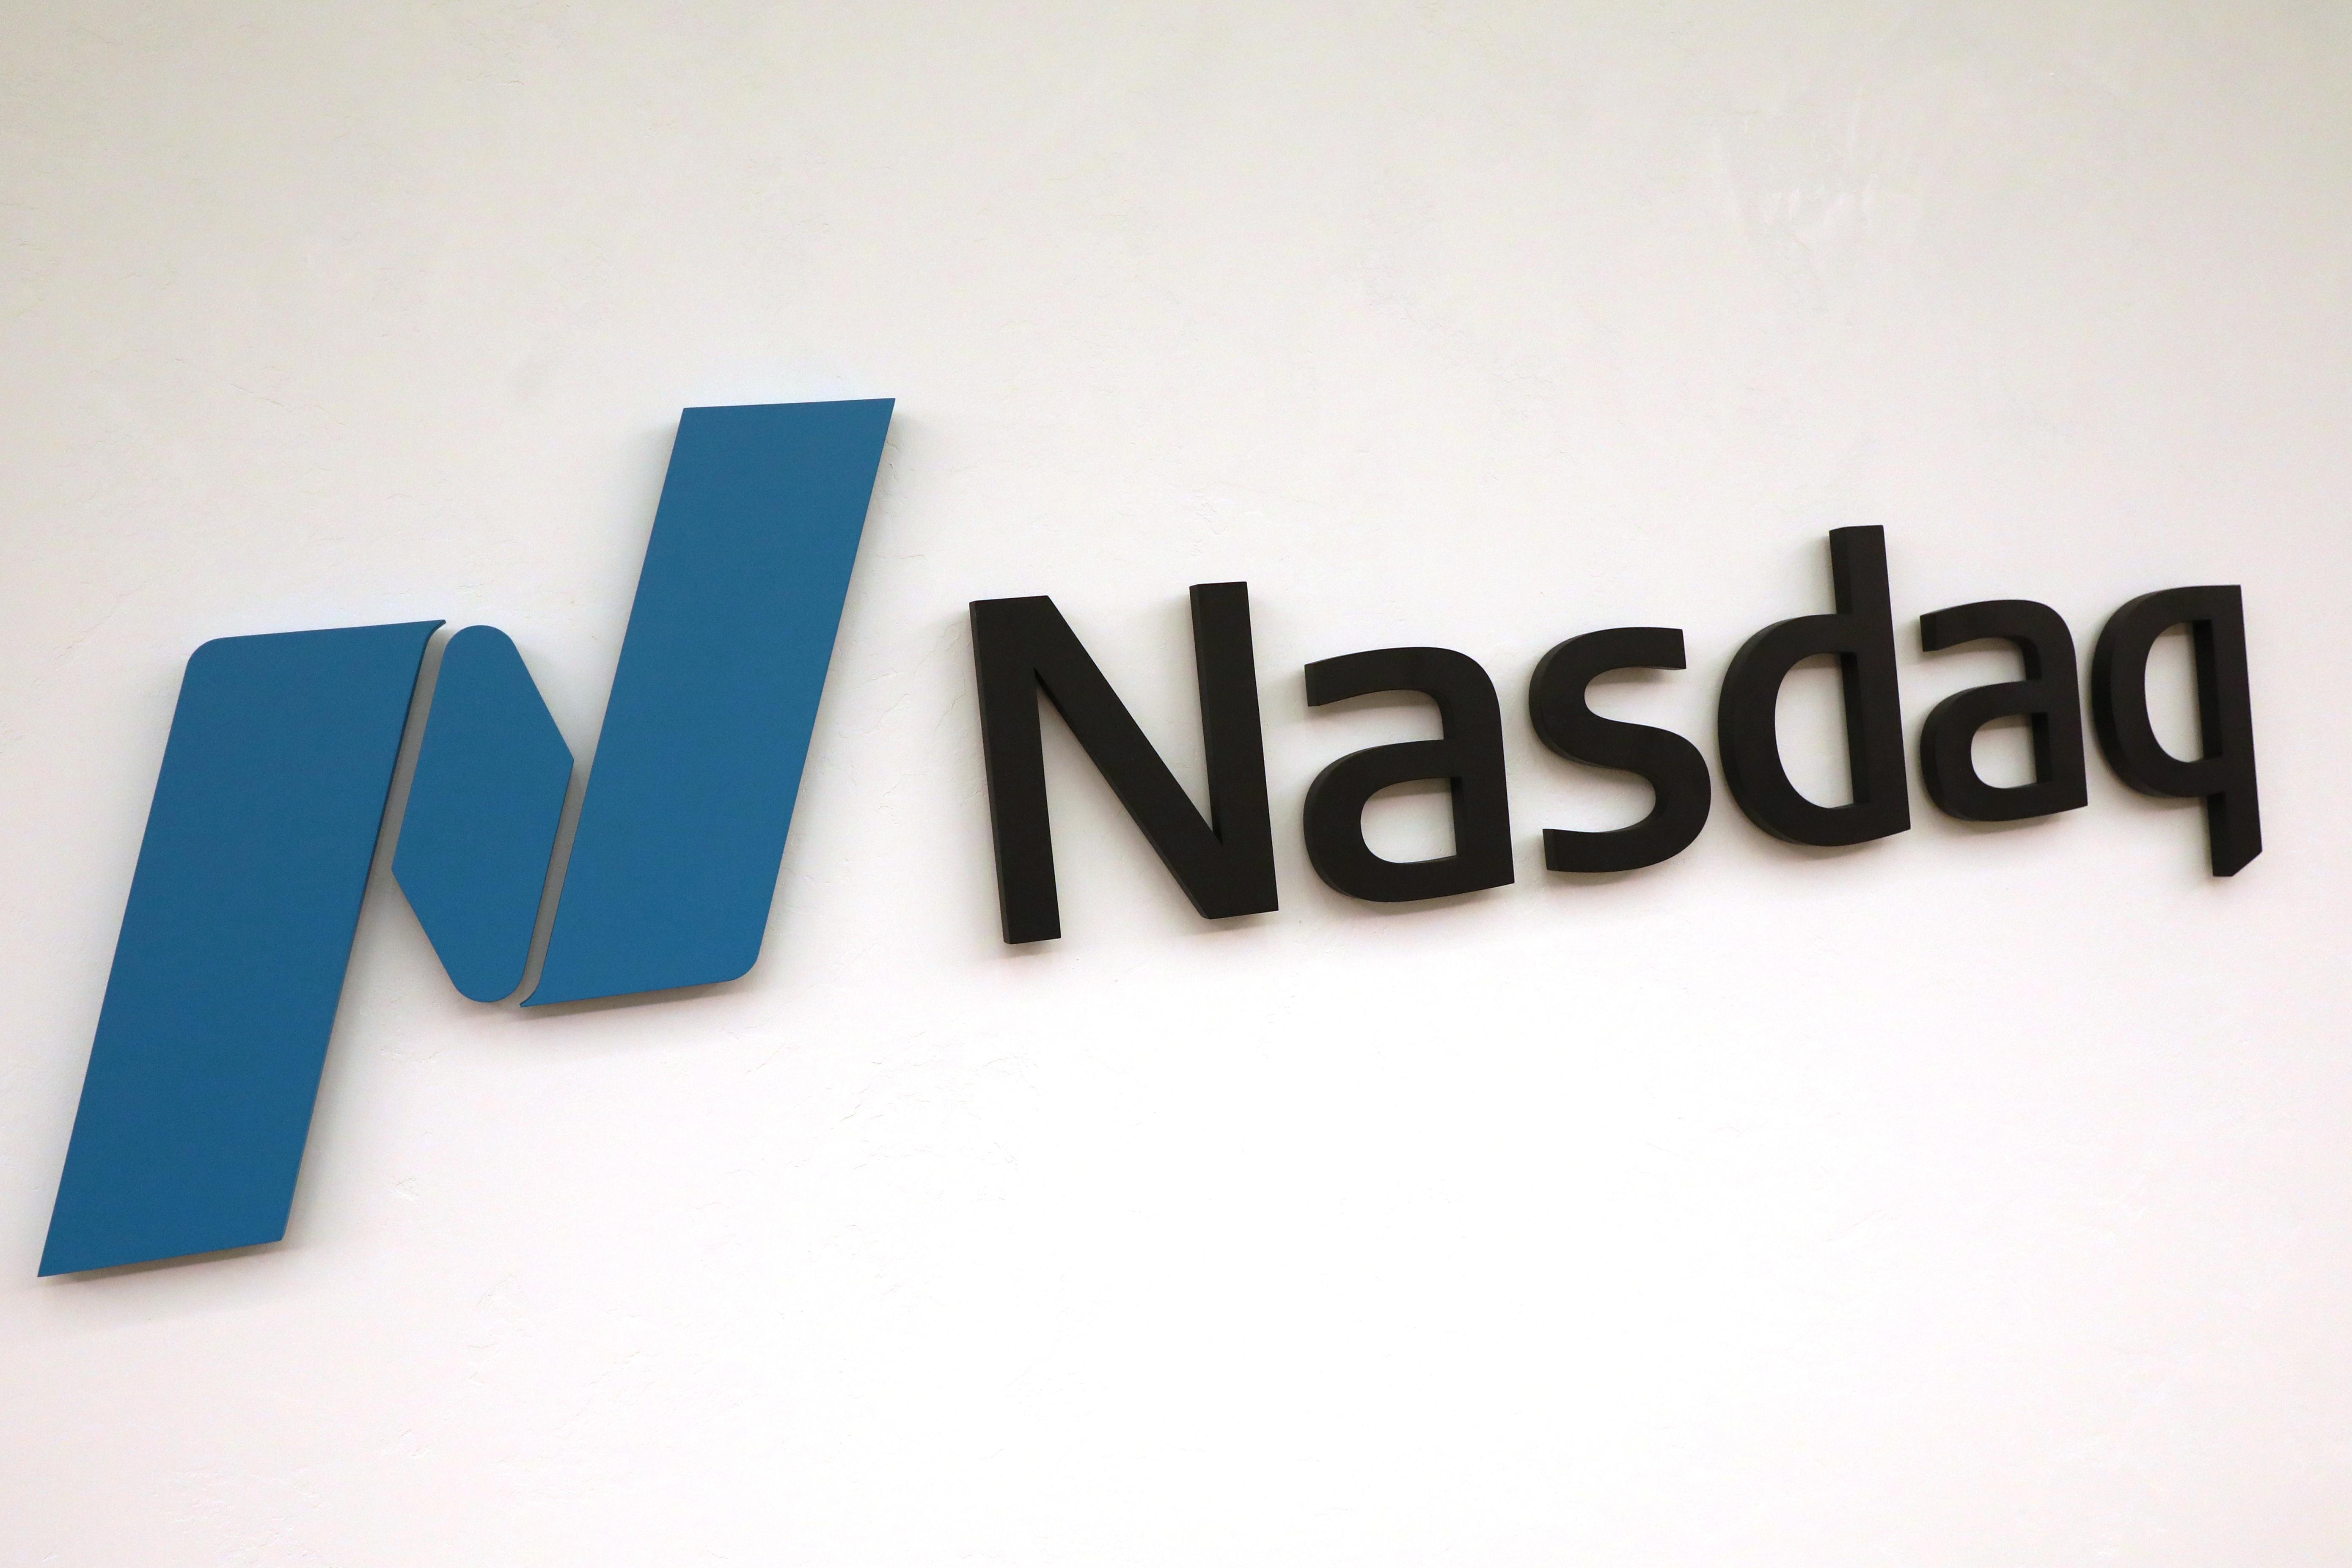 The Nasdaq logo is displayed at the Nasdaq Market site in New York, U.S., May 2, 2019. REUTERS/Brendan McDermid/Files